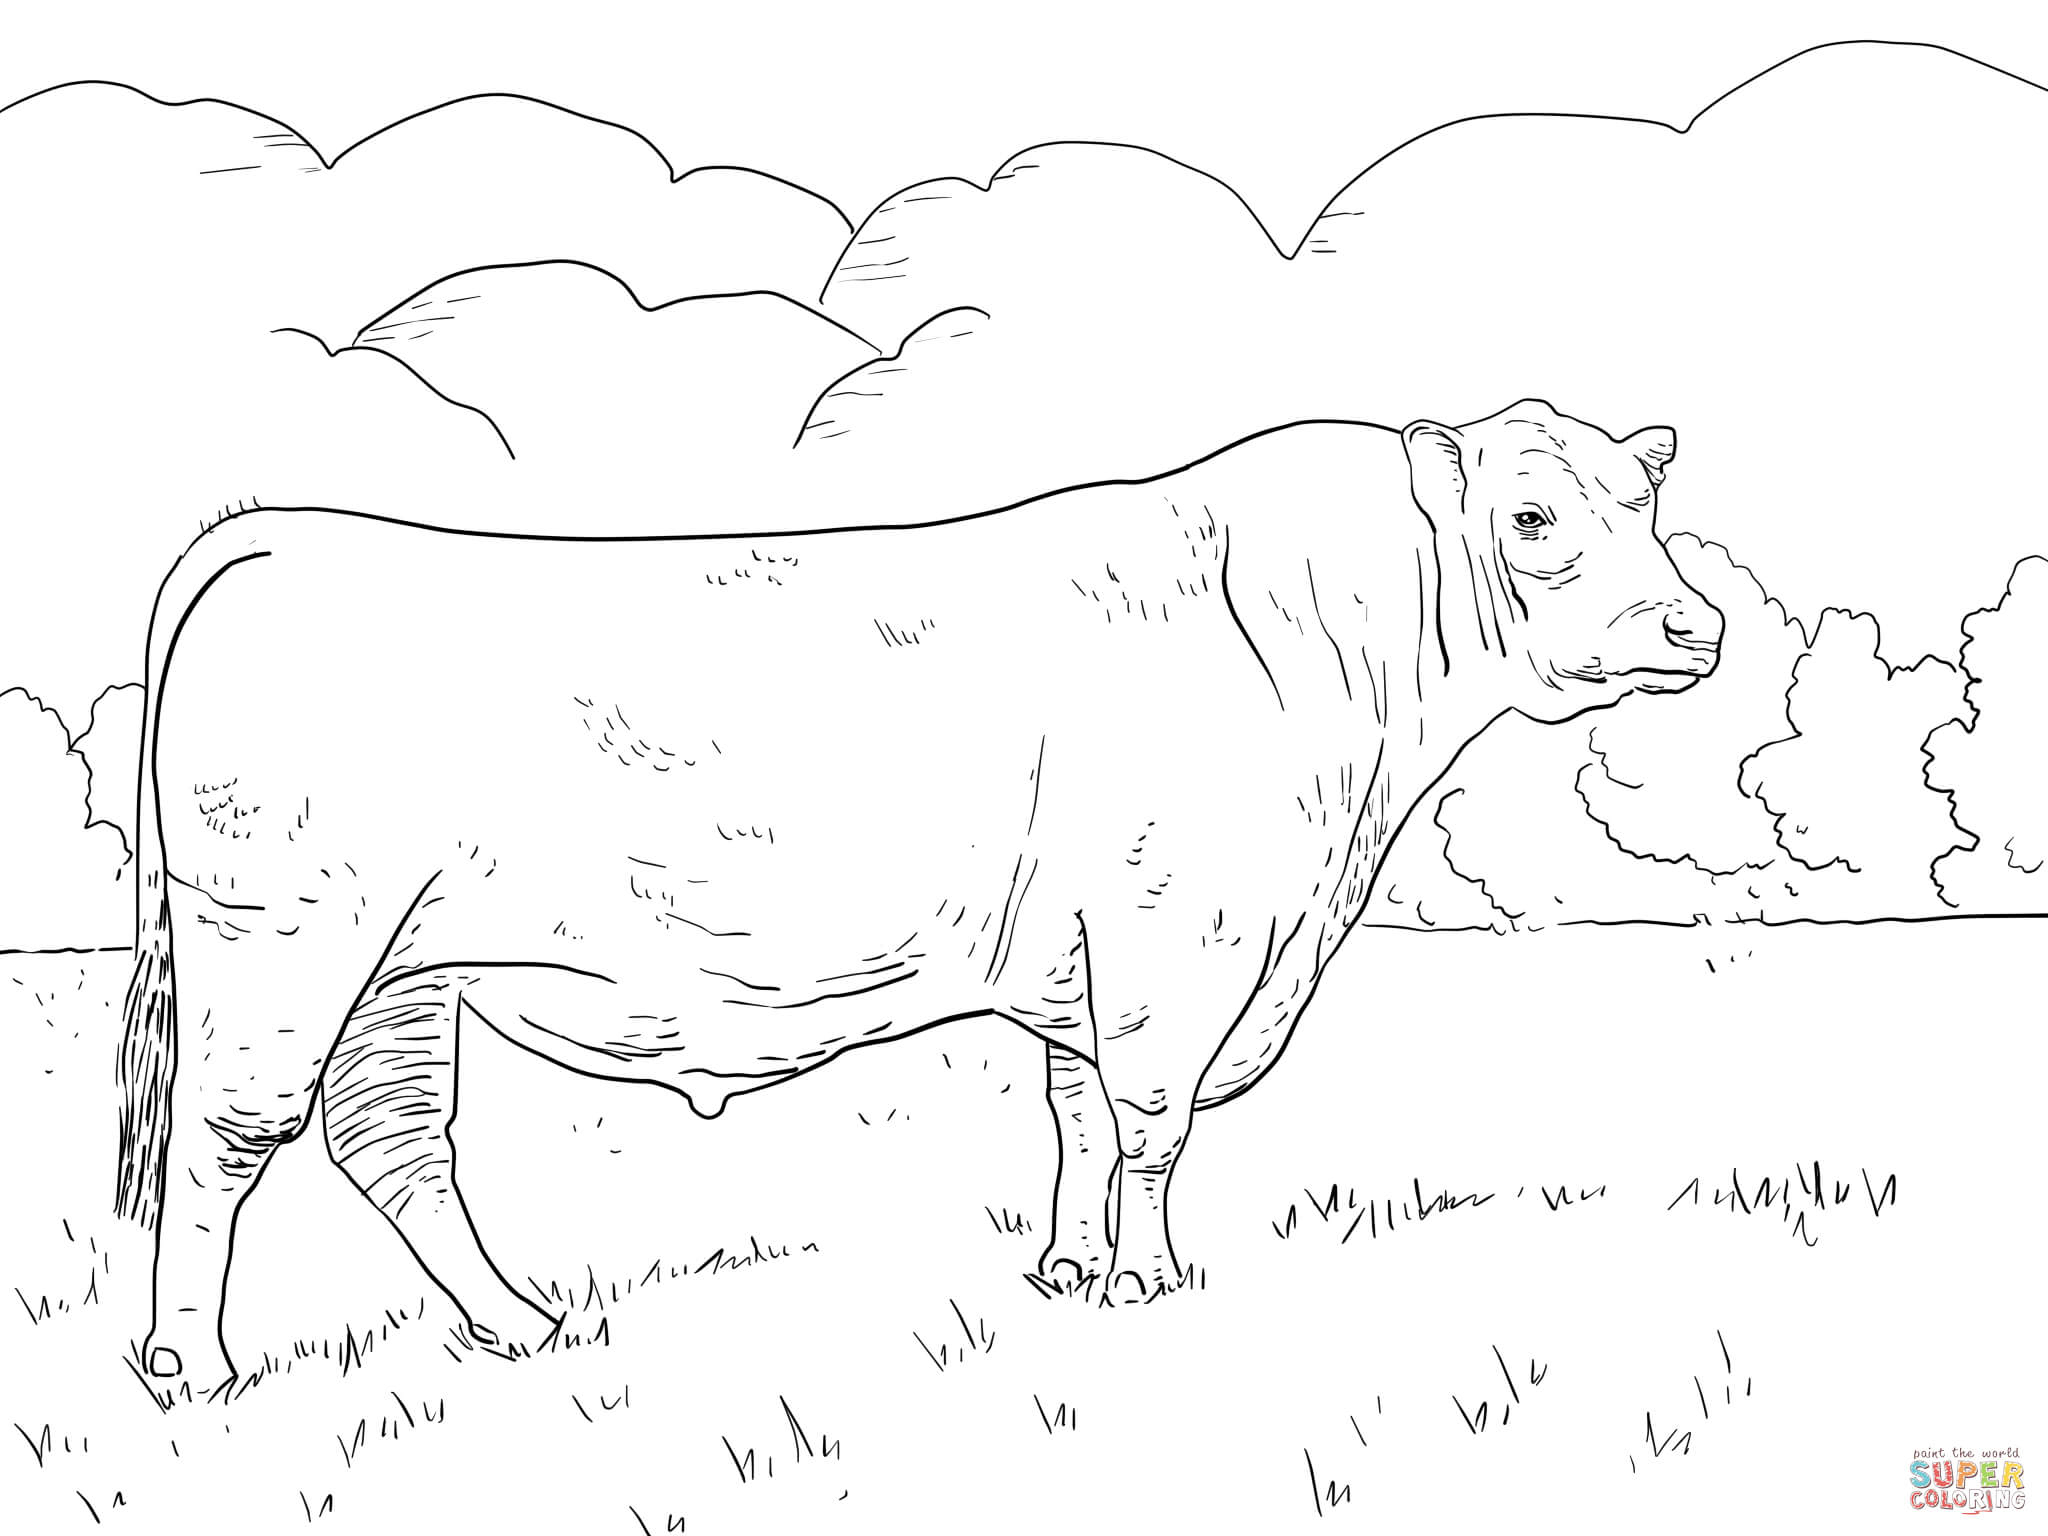 Angus Bull Coloring Page   Free Printable Coloring Pages - Coloring Pages Of Cows Free Printable